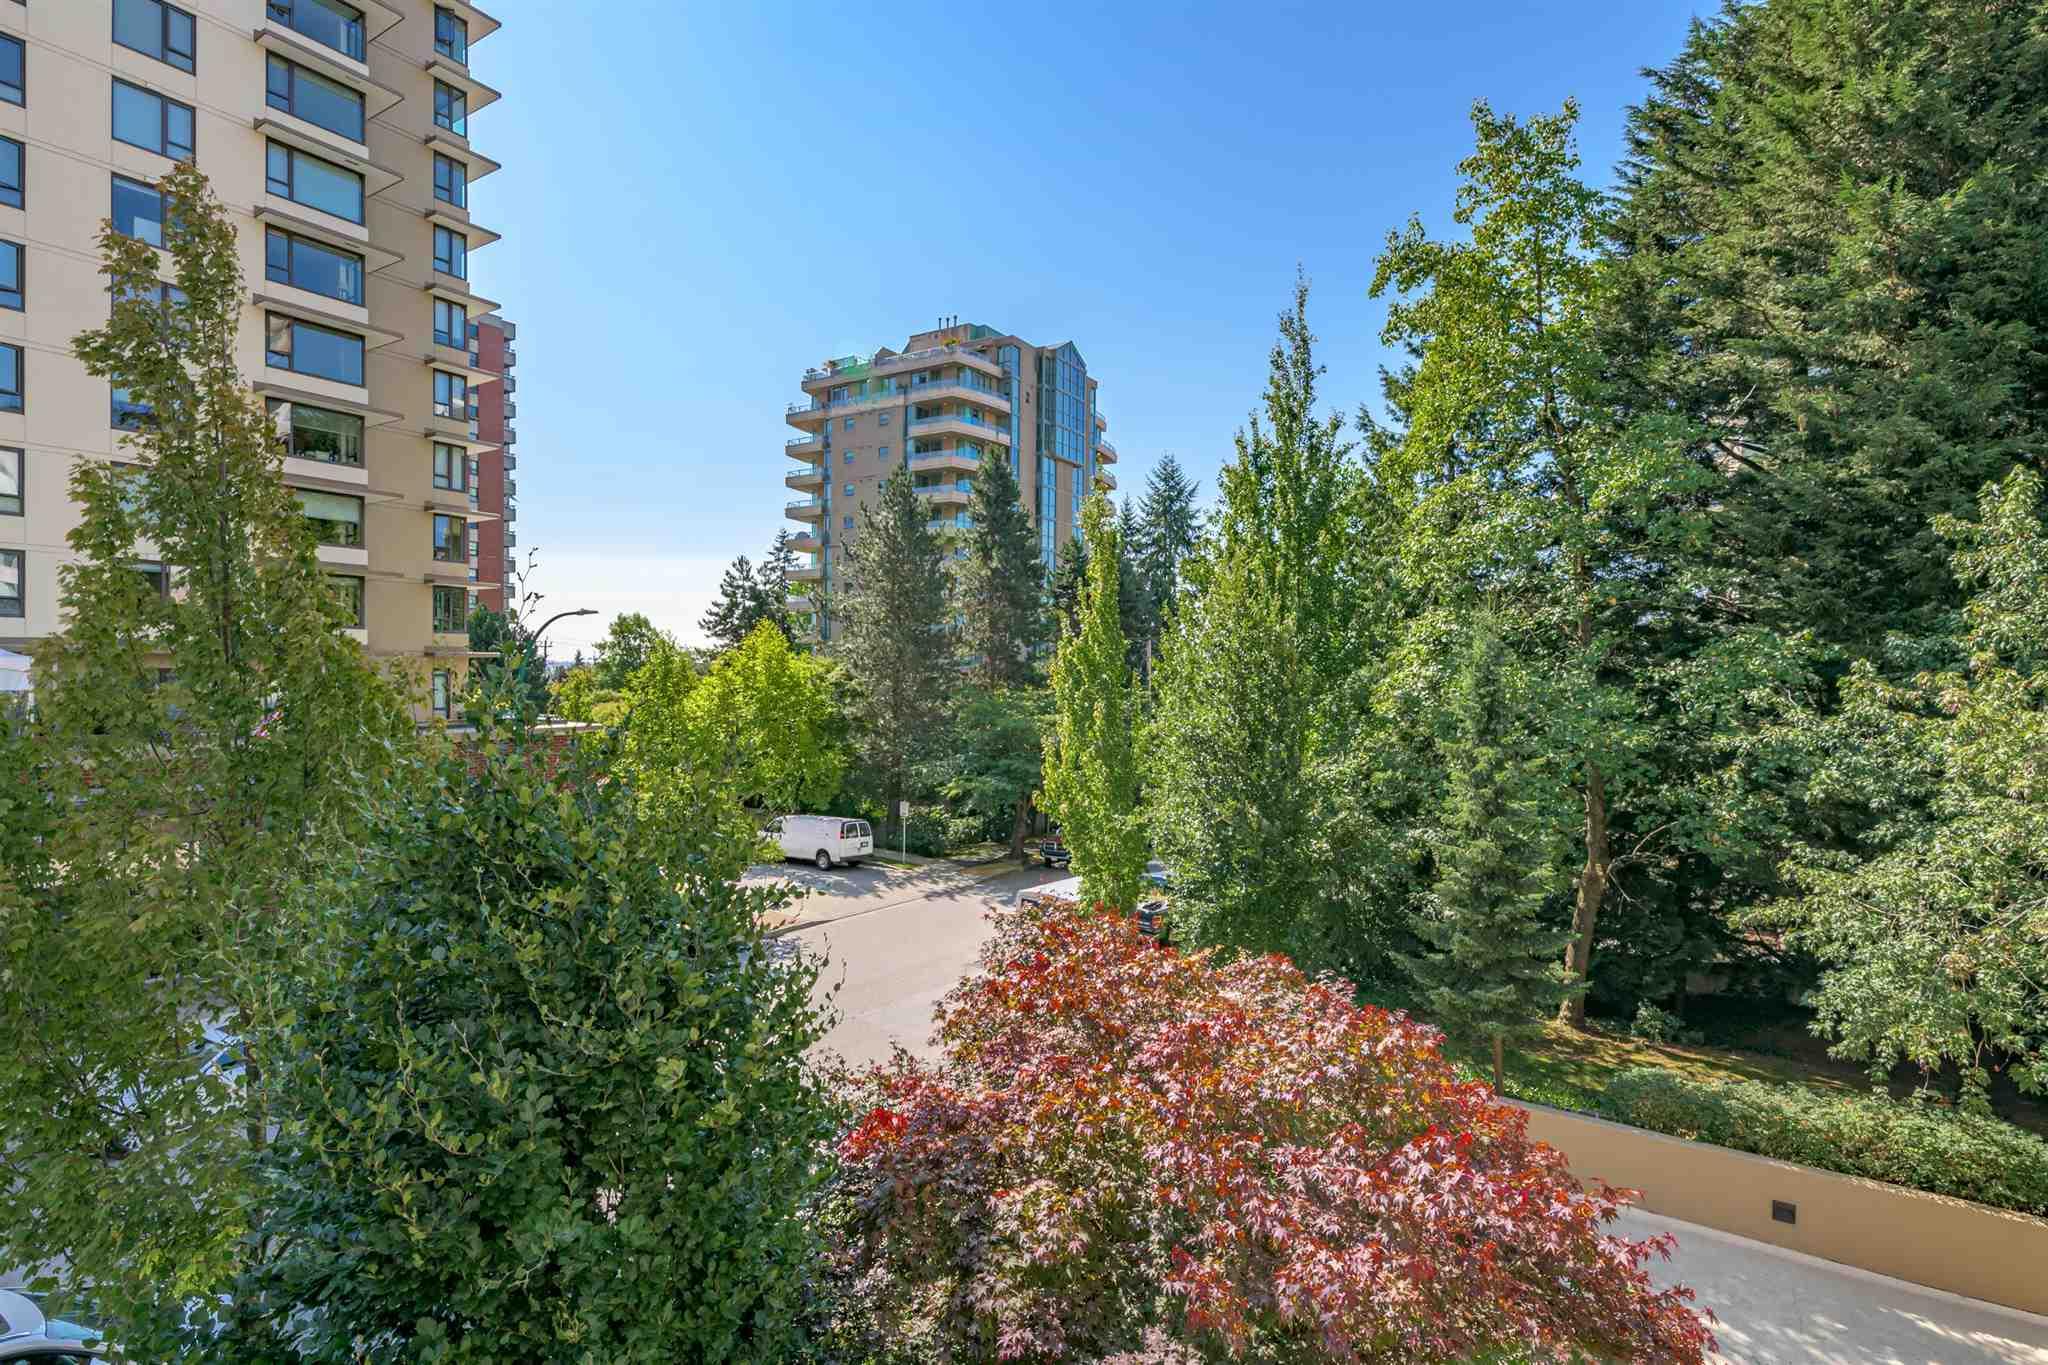 205 7225 ACORN AVENUE - Highgate Apartment/Condo for sale, 2 Bedrooms (R2606454) - #22